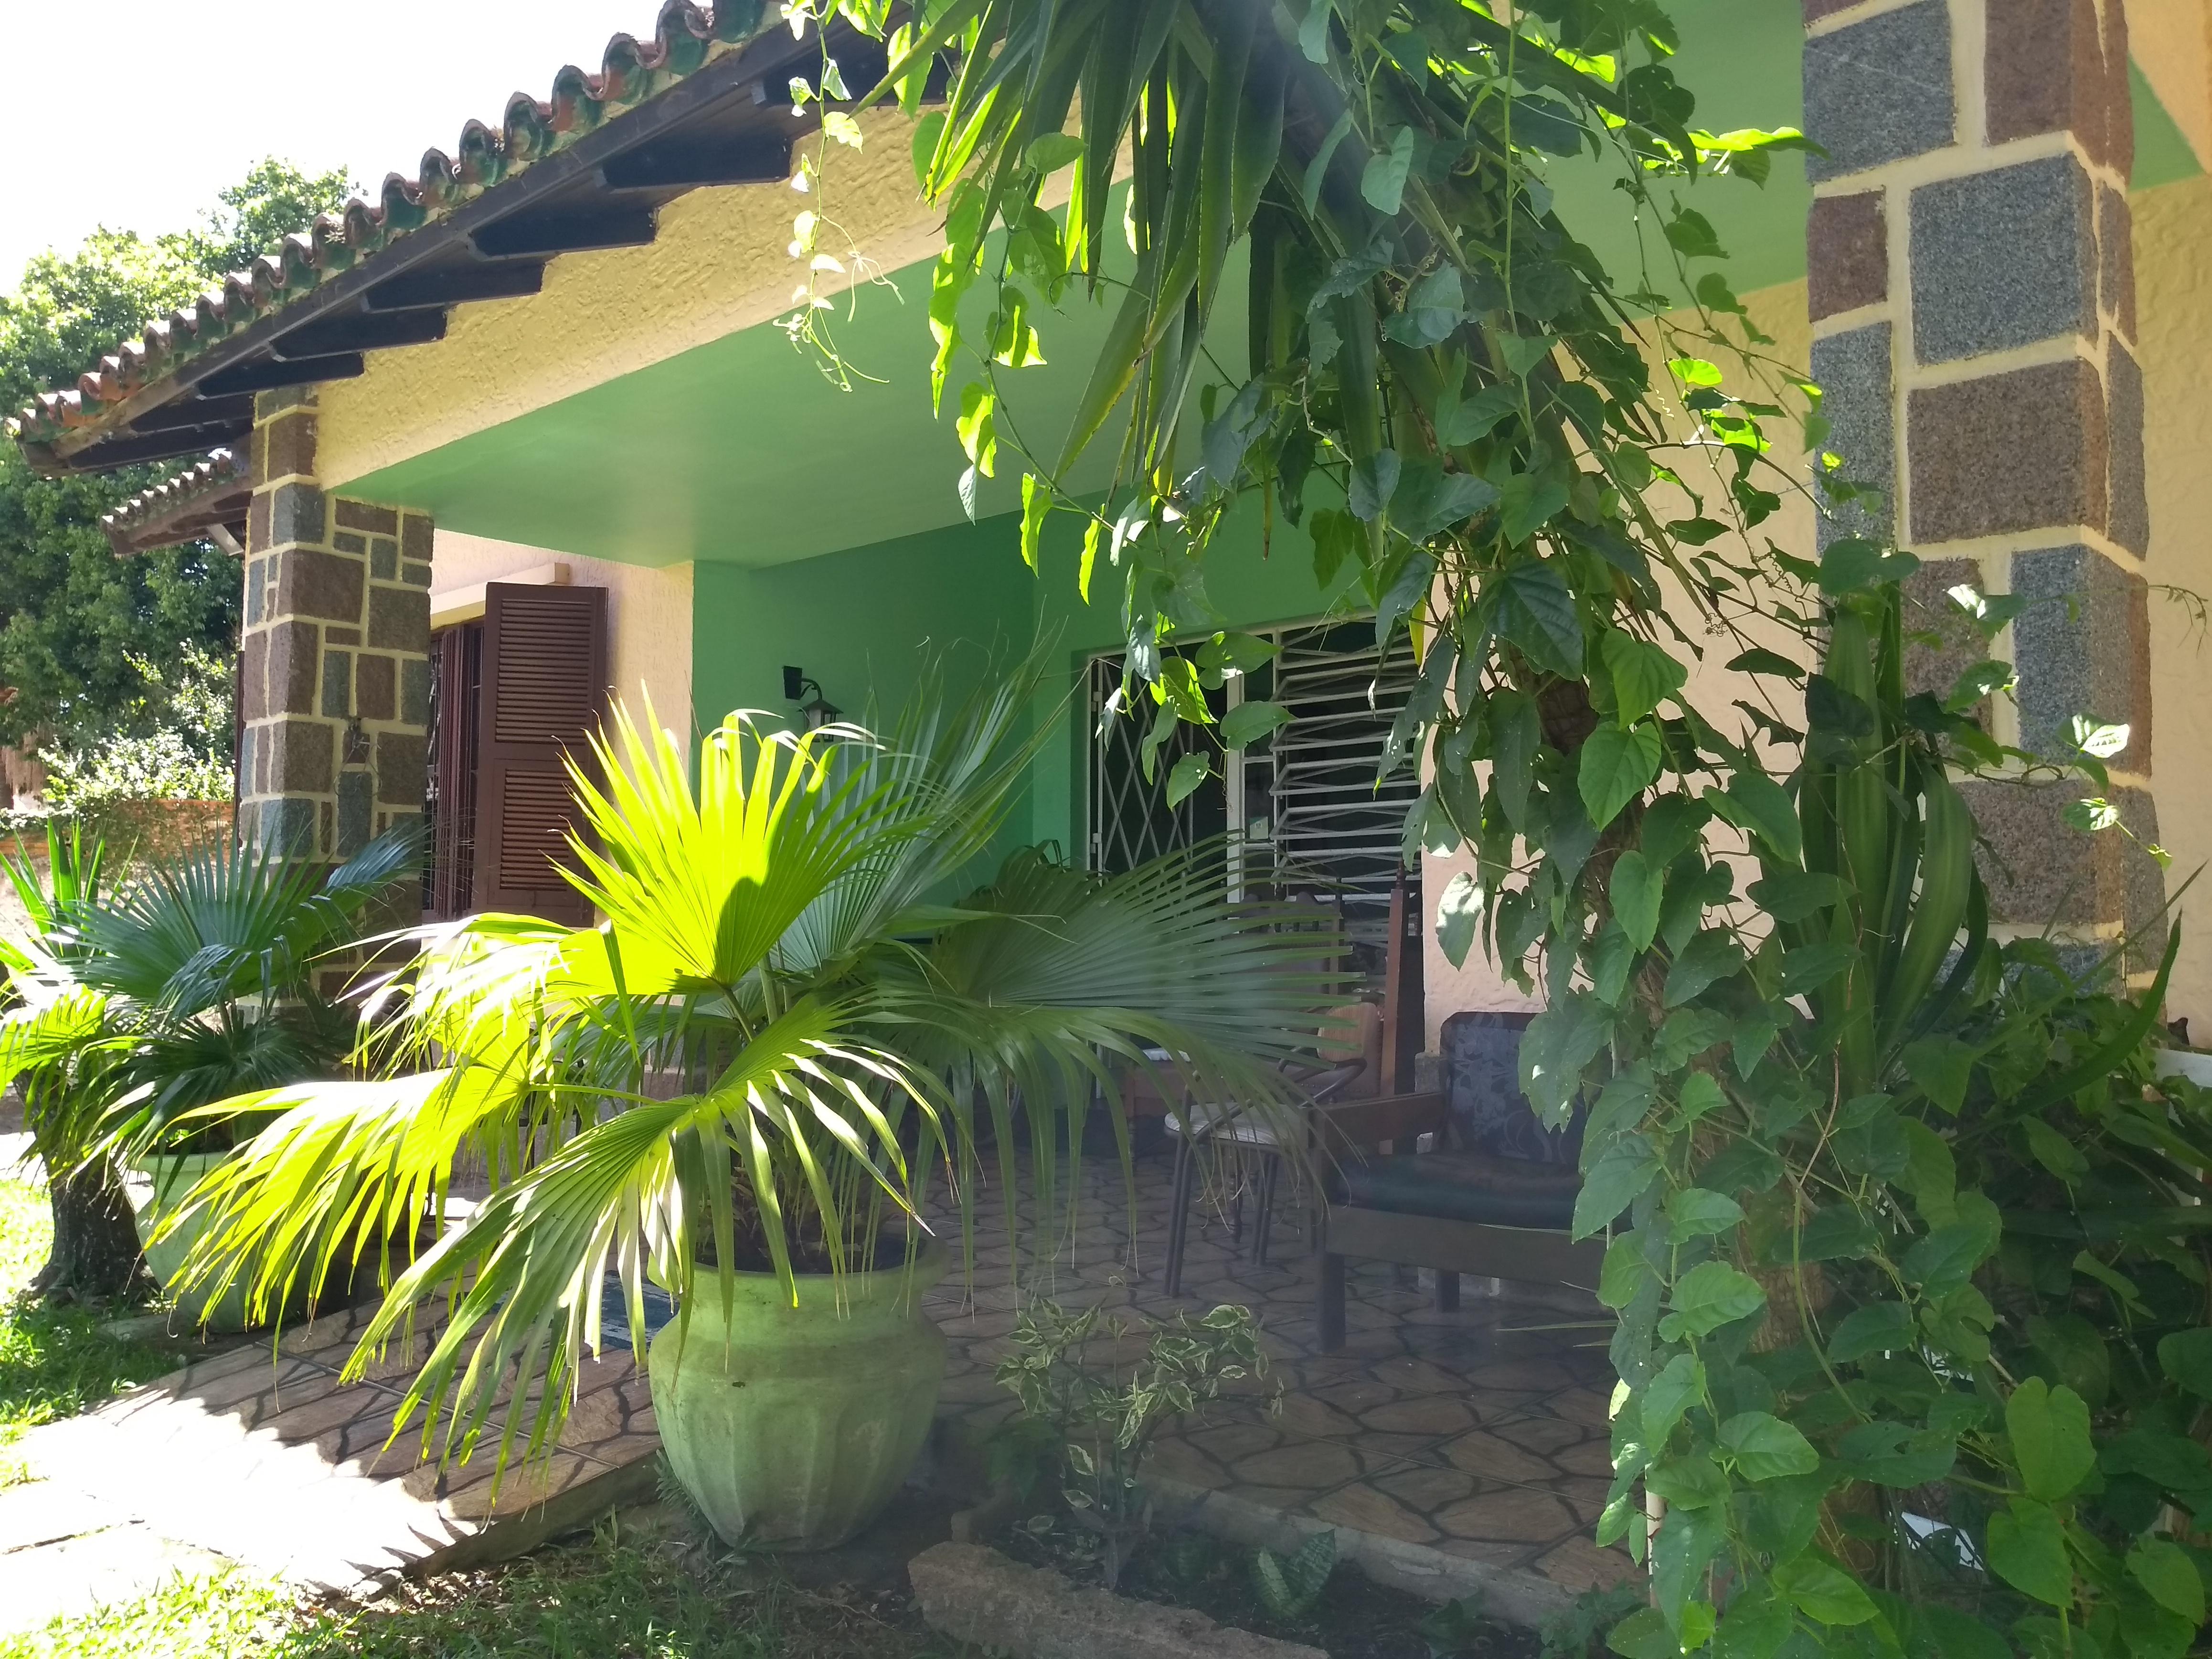 Fachada da Geriatria Santo Antônio, Porto Alegre. Residencial Geriátrico Santo Antônio Zona Sul